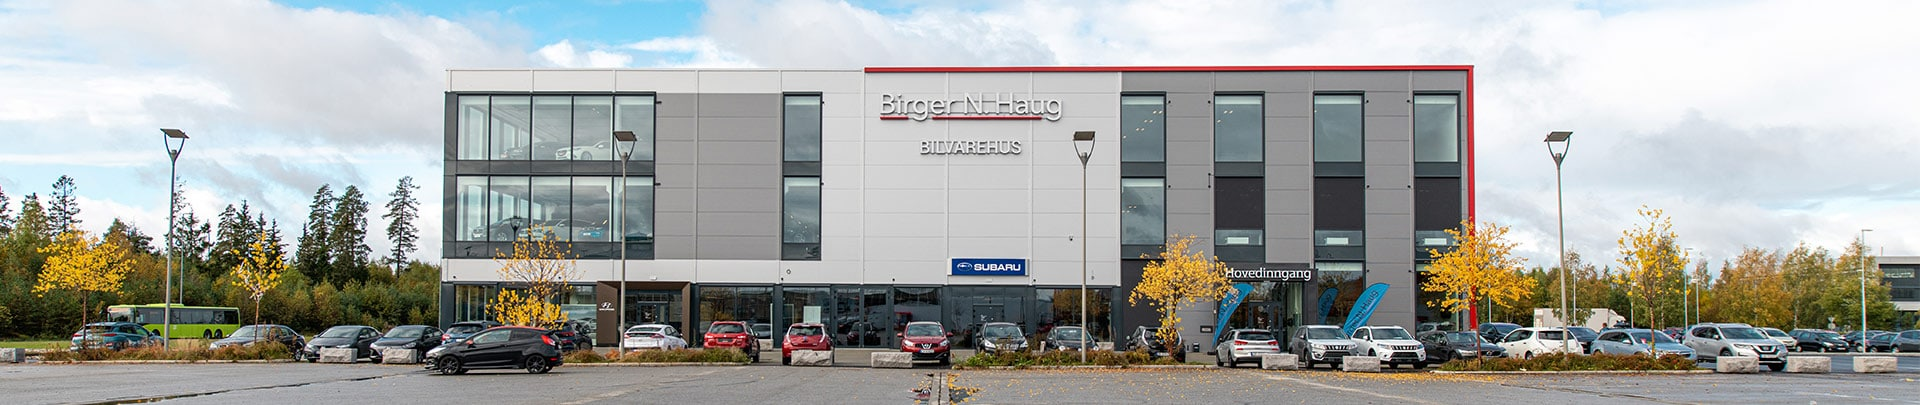 Bygg ute Birger N. Haug Gardermoen